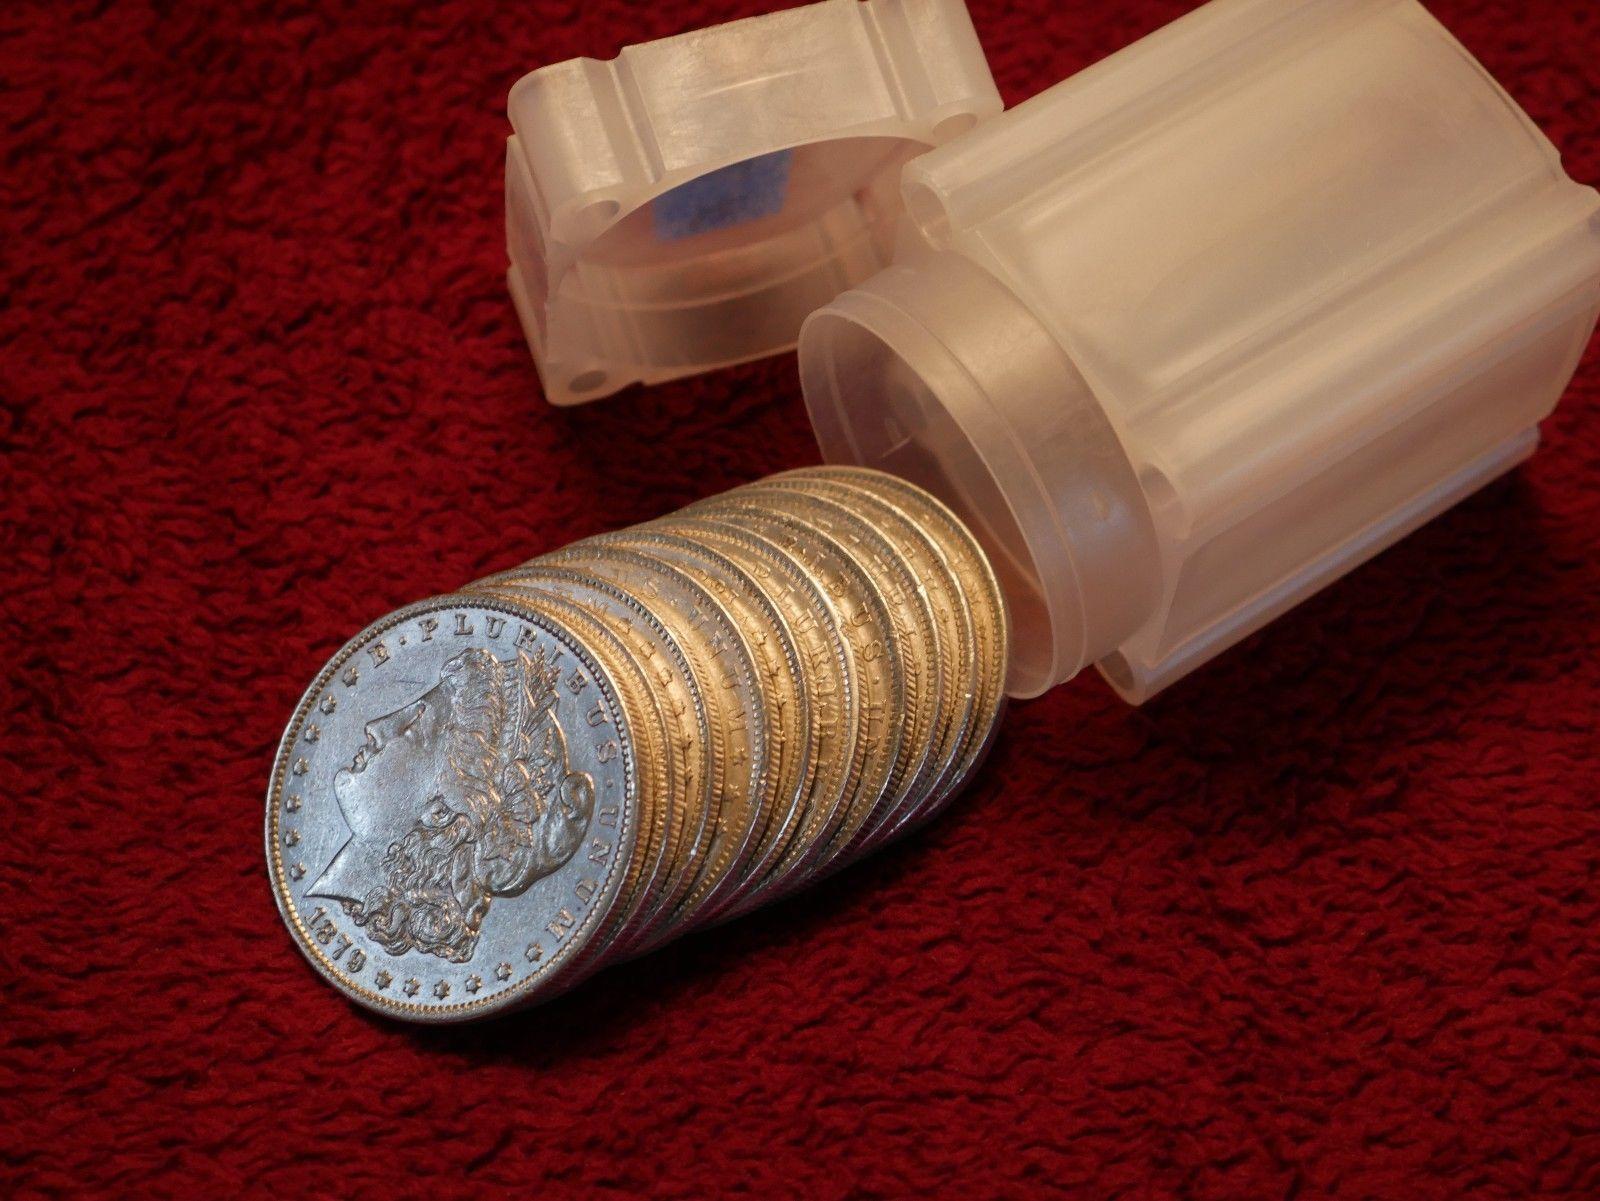 Morgan Dollar Lot 1/2 Roll Pre 1888   AU to AU   FREE SHIPPING   (my #771)  https://t.co/ciJZuzvzC8 https://t.co/55Fr43hZ7a